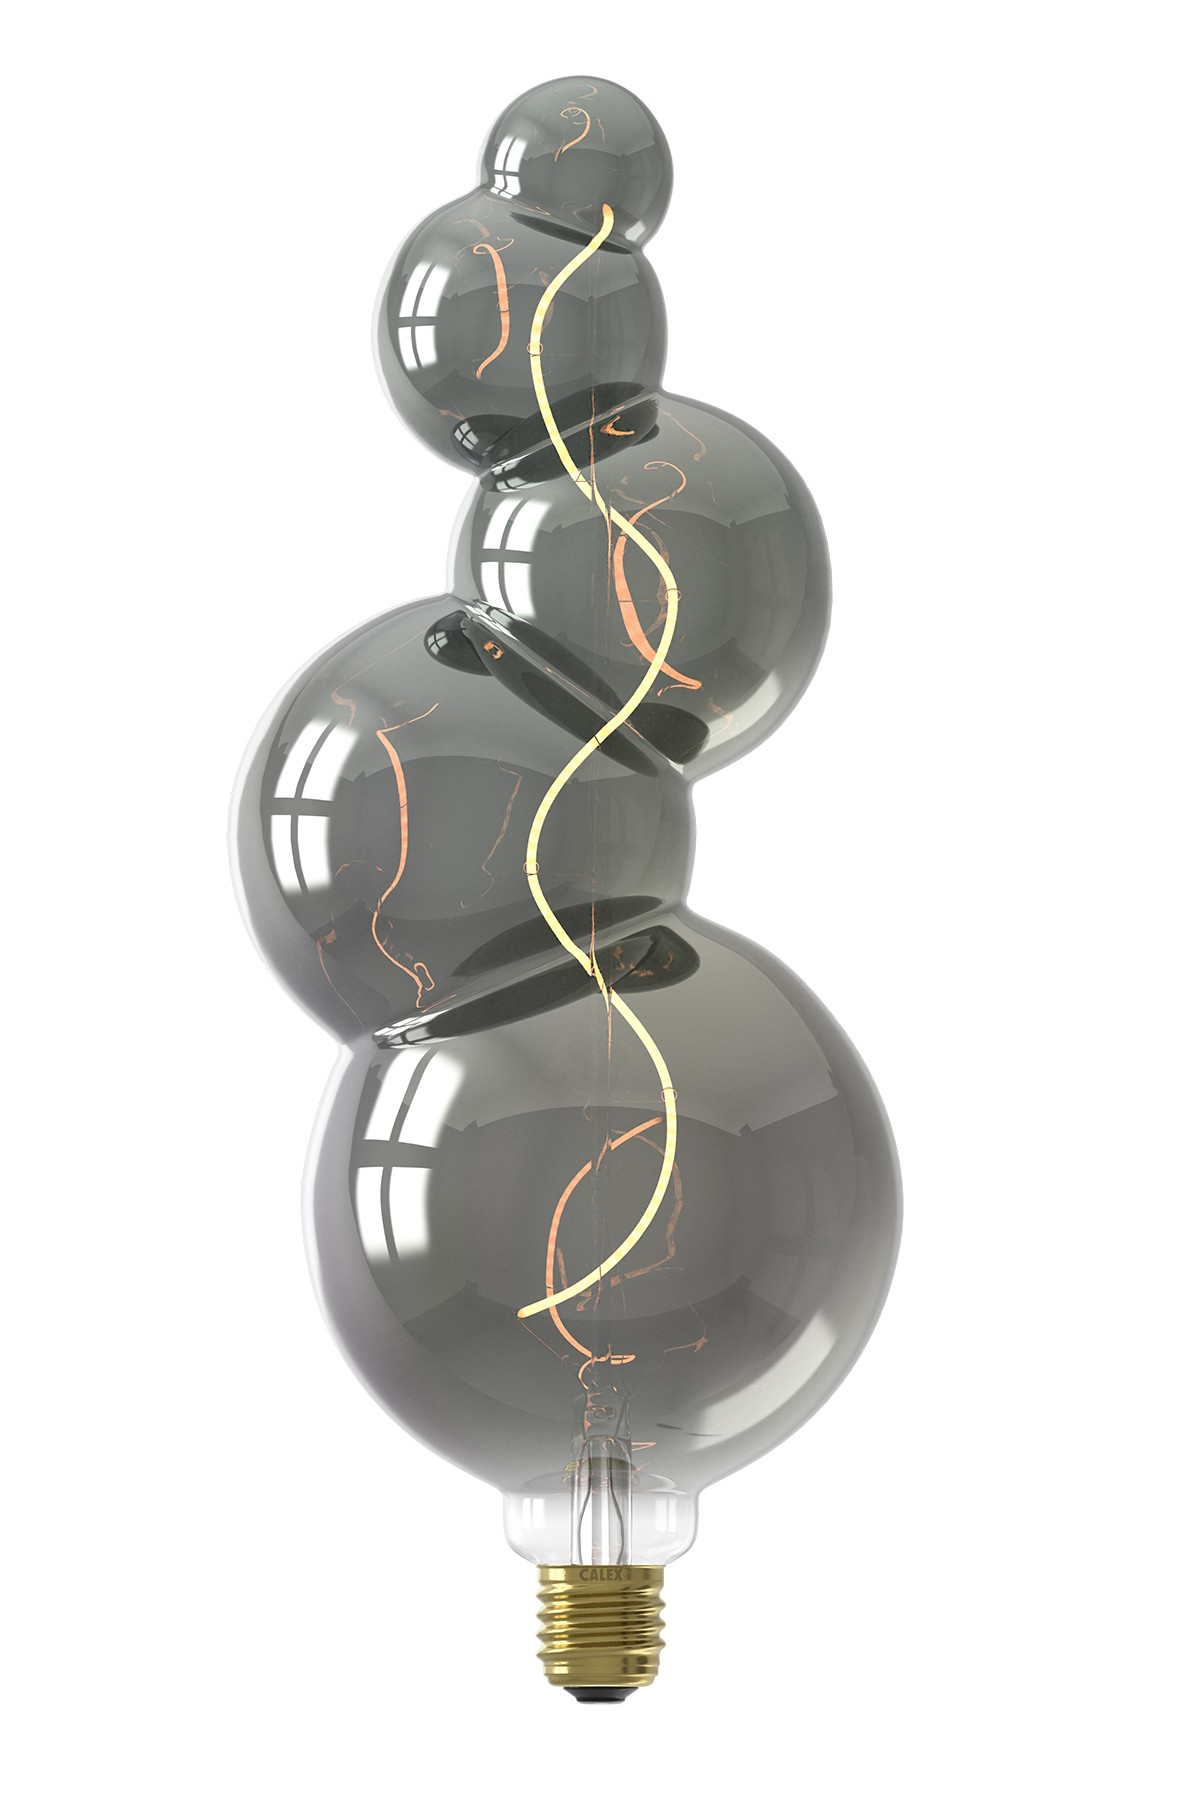 Calex Alicante Led lamp 240V 4W 60lm E27, Titanium 2100K dimbaar